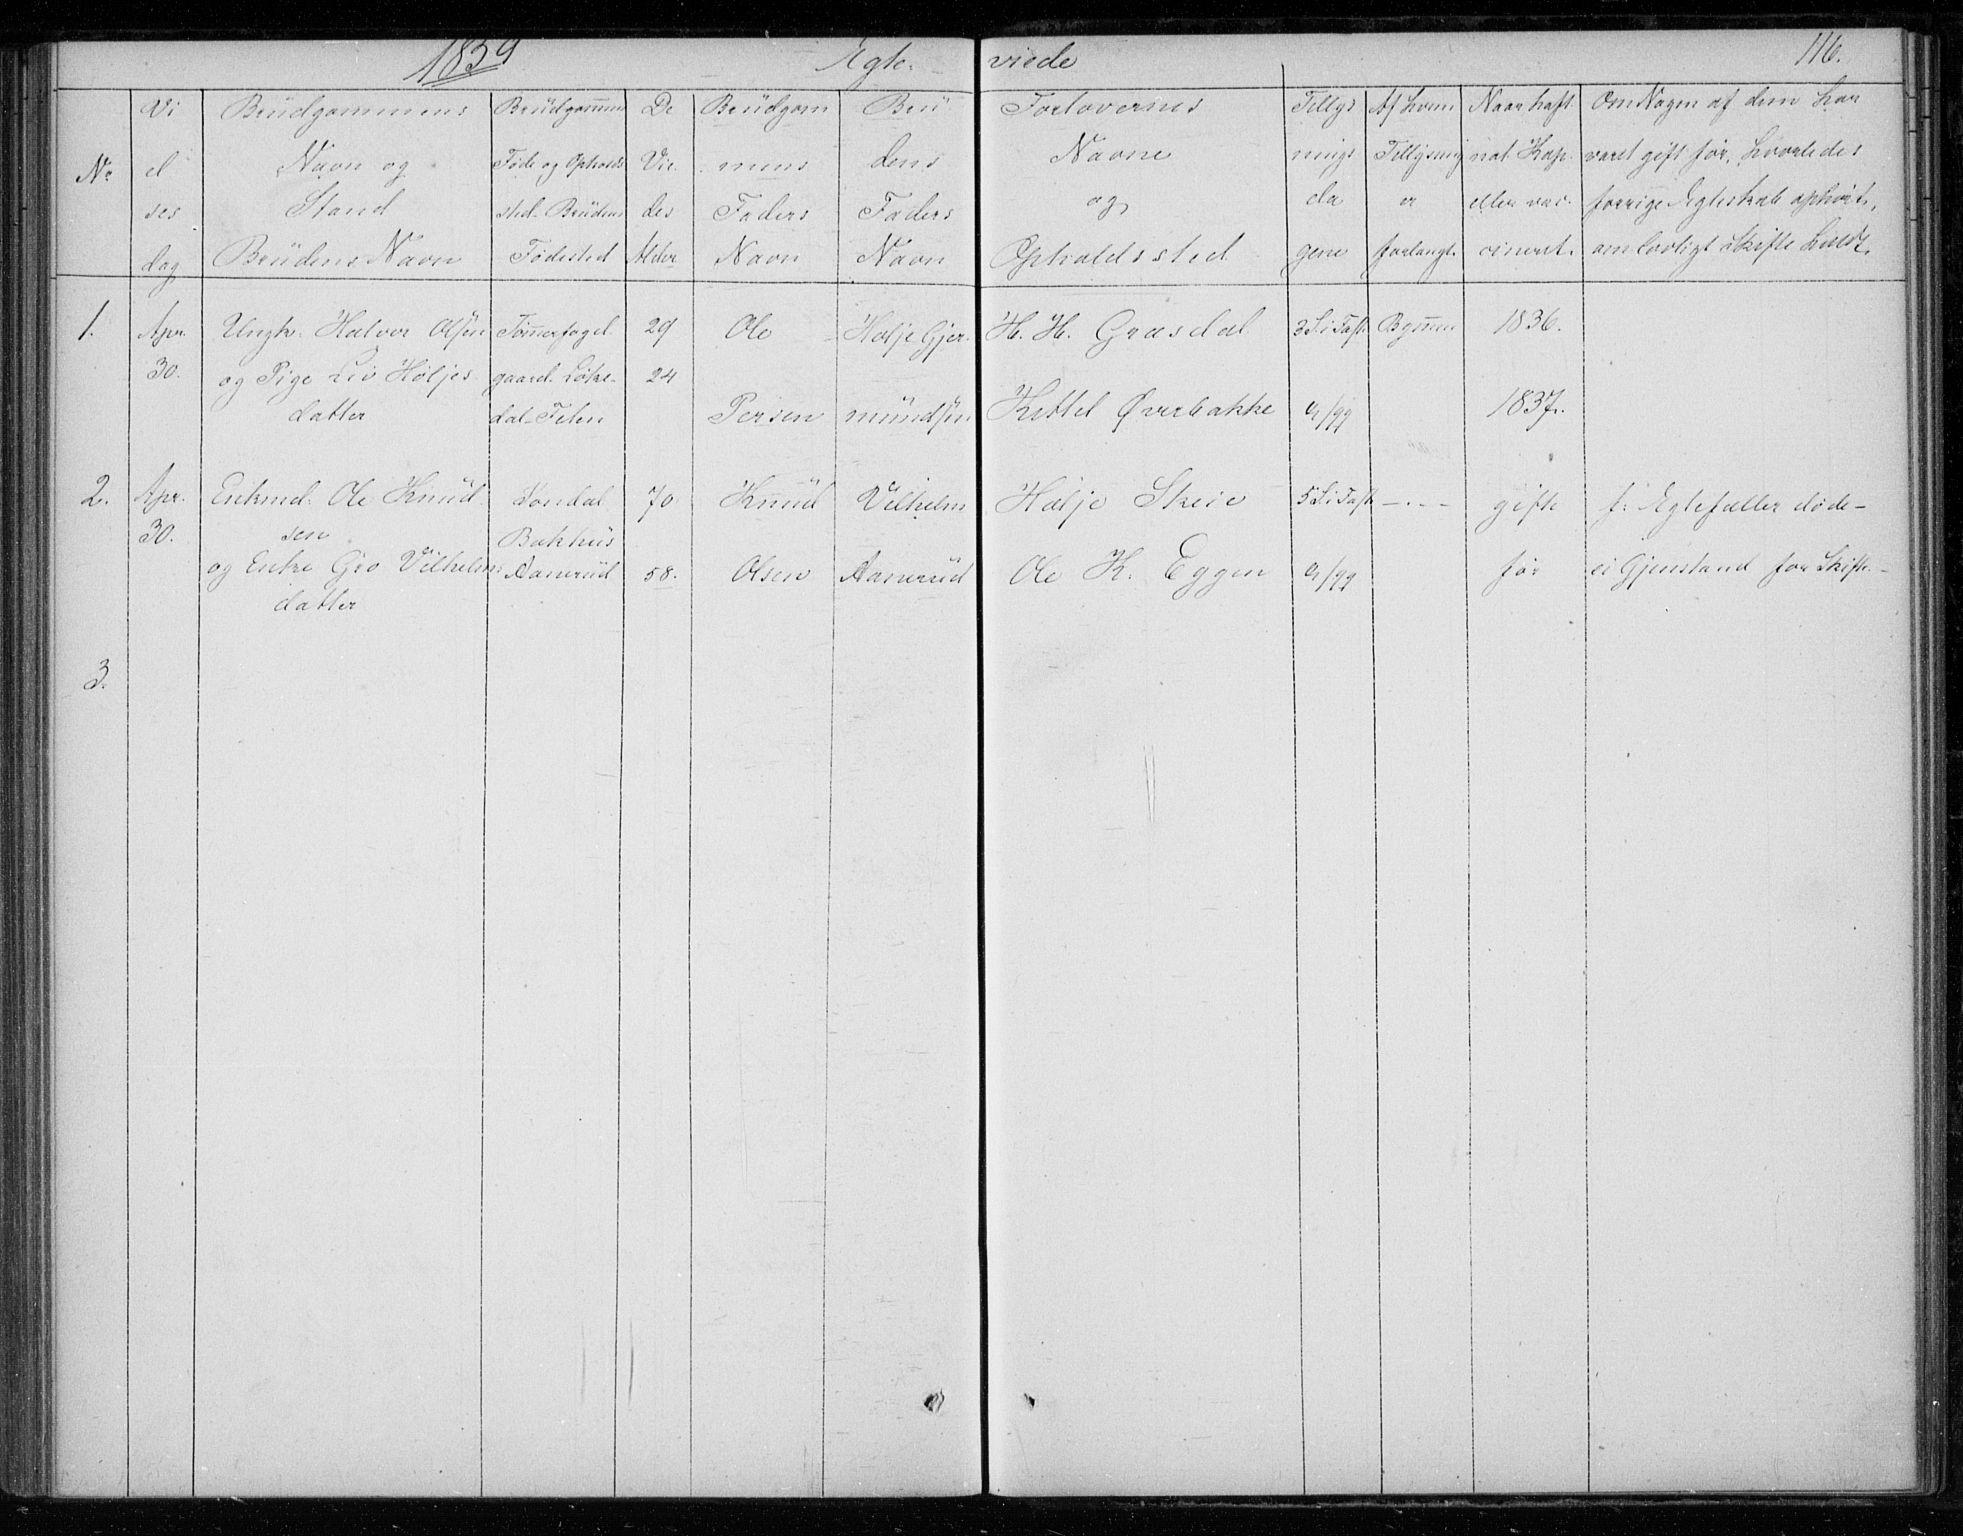 SAKO, Gransherad kirkebøker, F/Fb/L0003: Ministerialbok nr. II 3, 1844-1859, s. 116